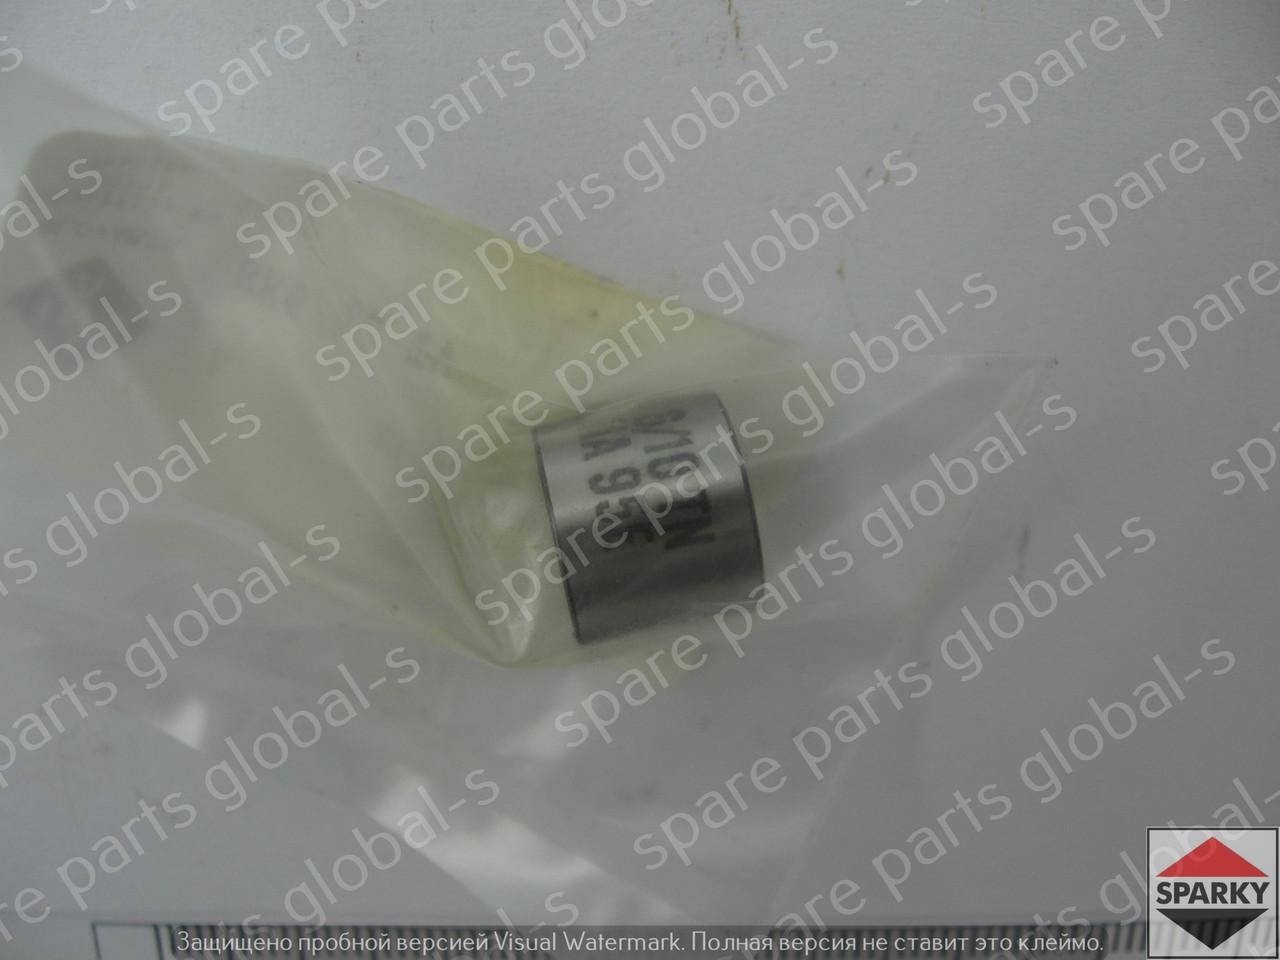 331109 Подшипник NK6/10 - TV SPARKY